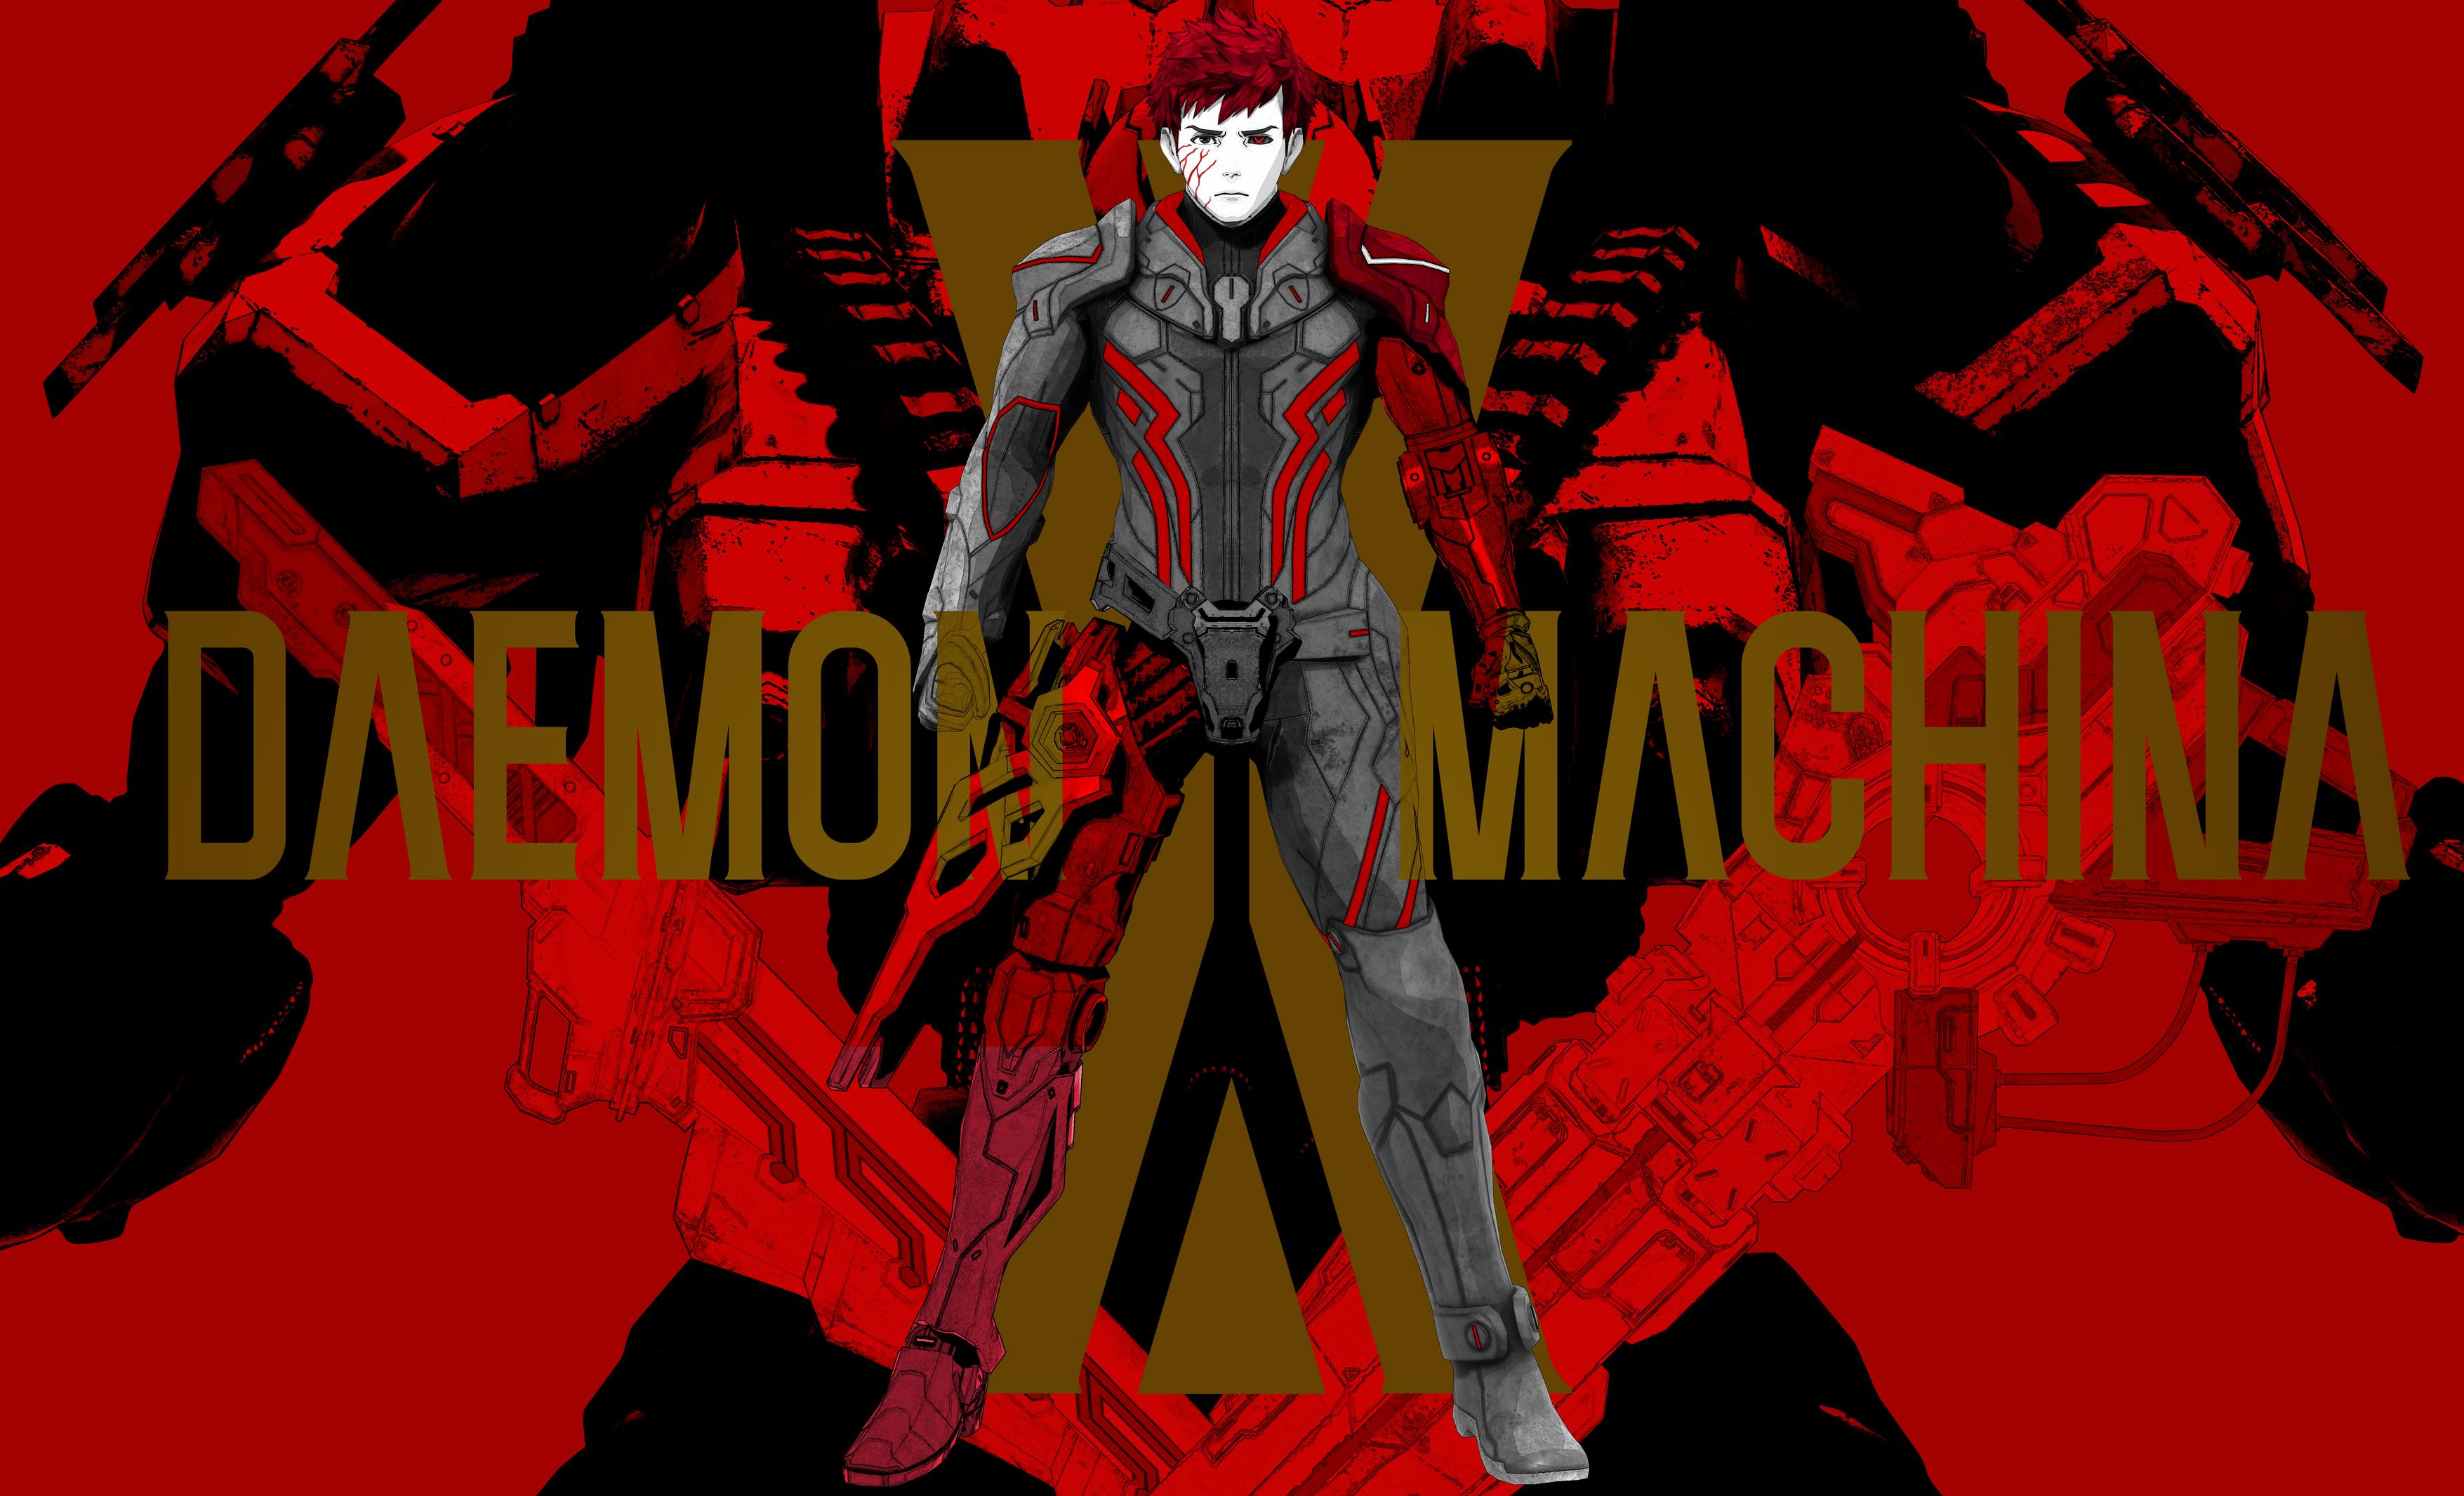 https://moegamer.files.wordpress.com/2019/02/switch_daemonxmachina_artwork.png